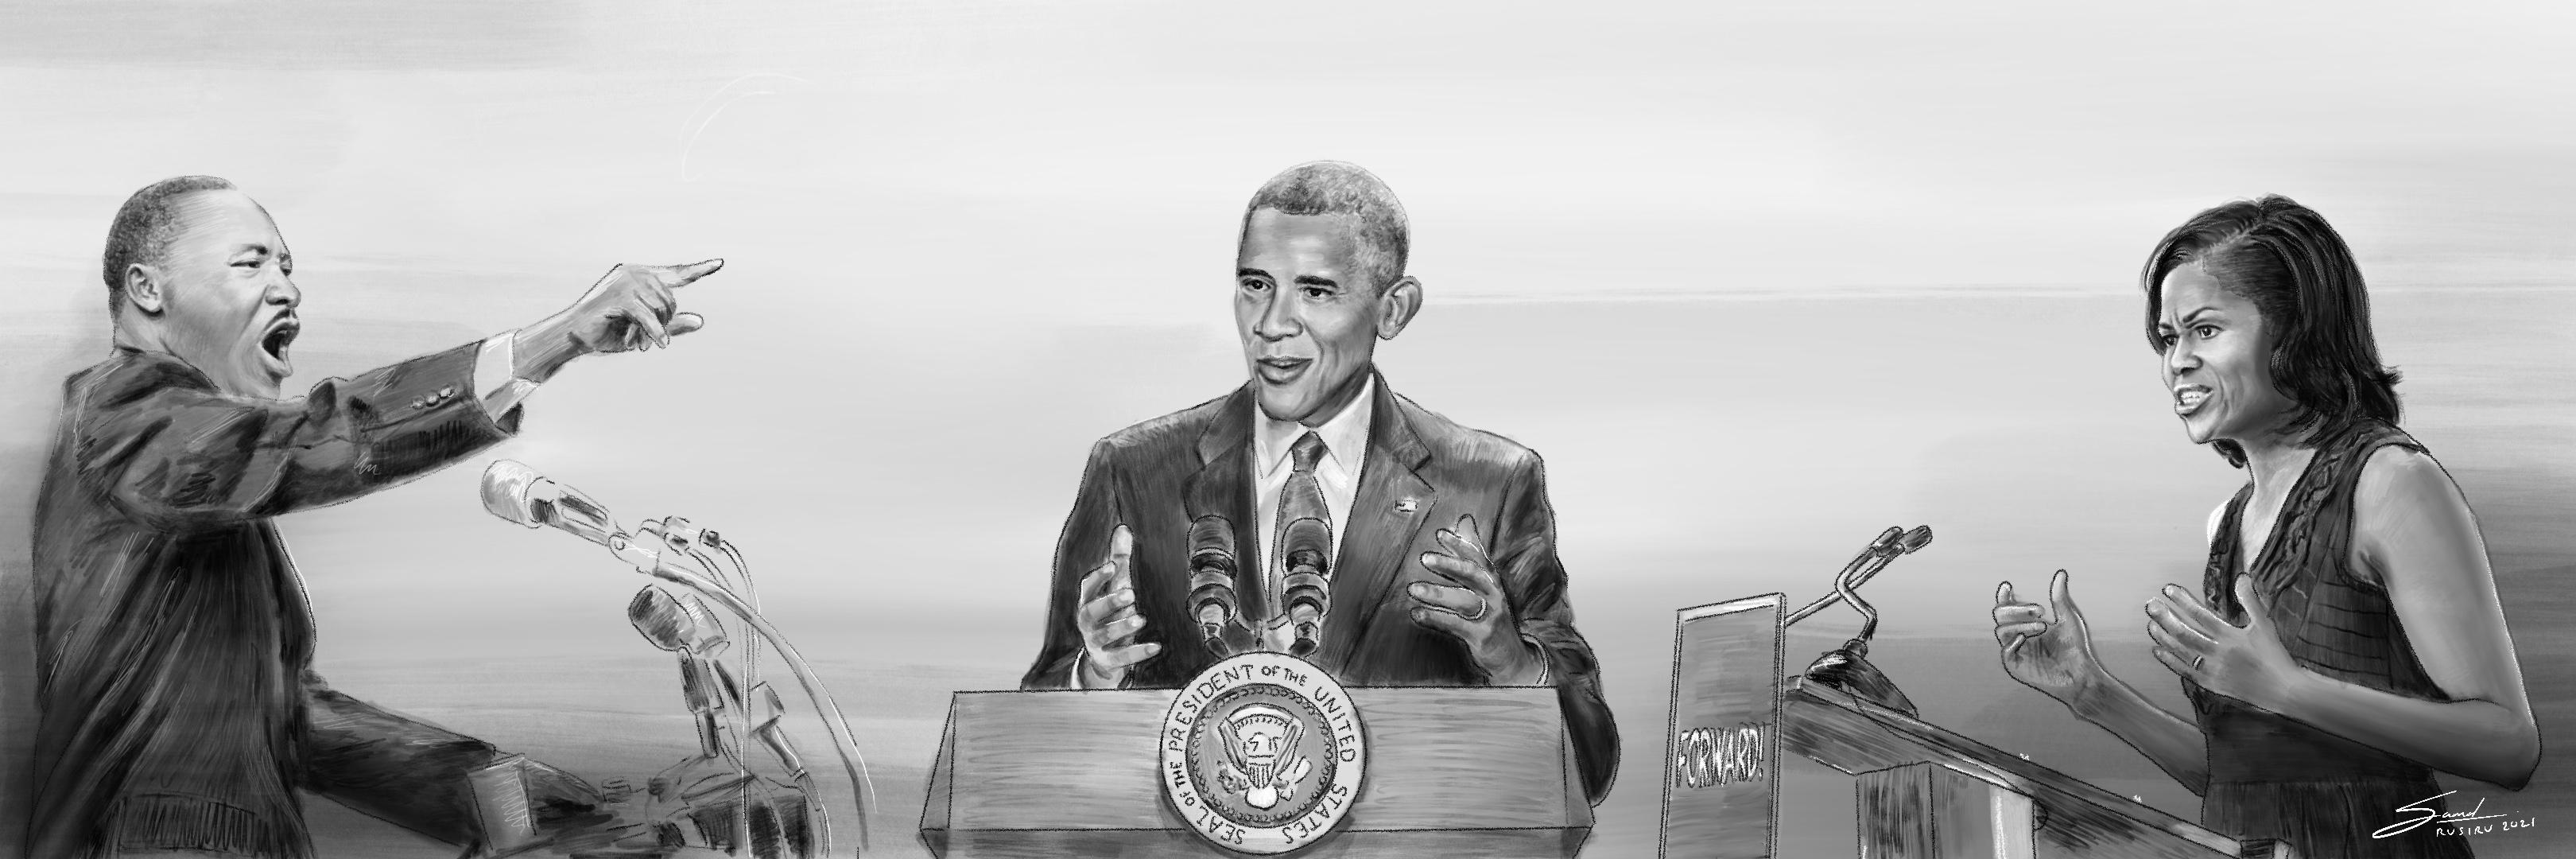 Poster of Martin Luther King.Jr, Barack Obama, and Michelle Obama.